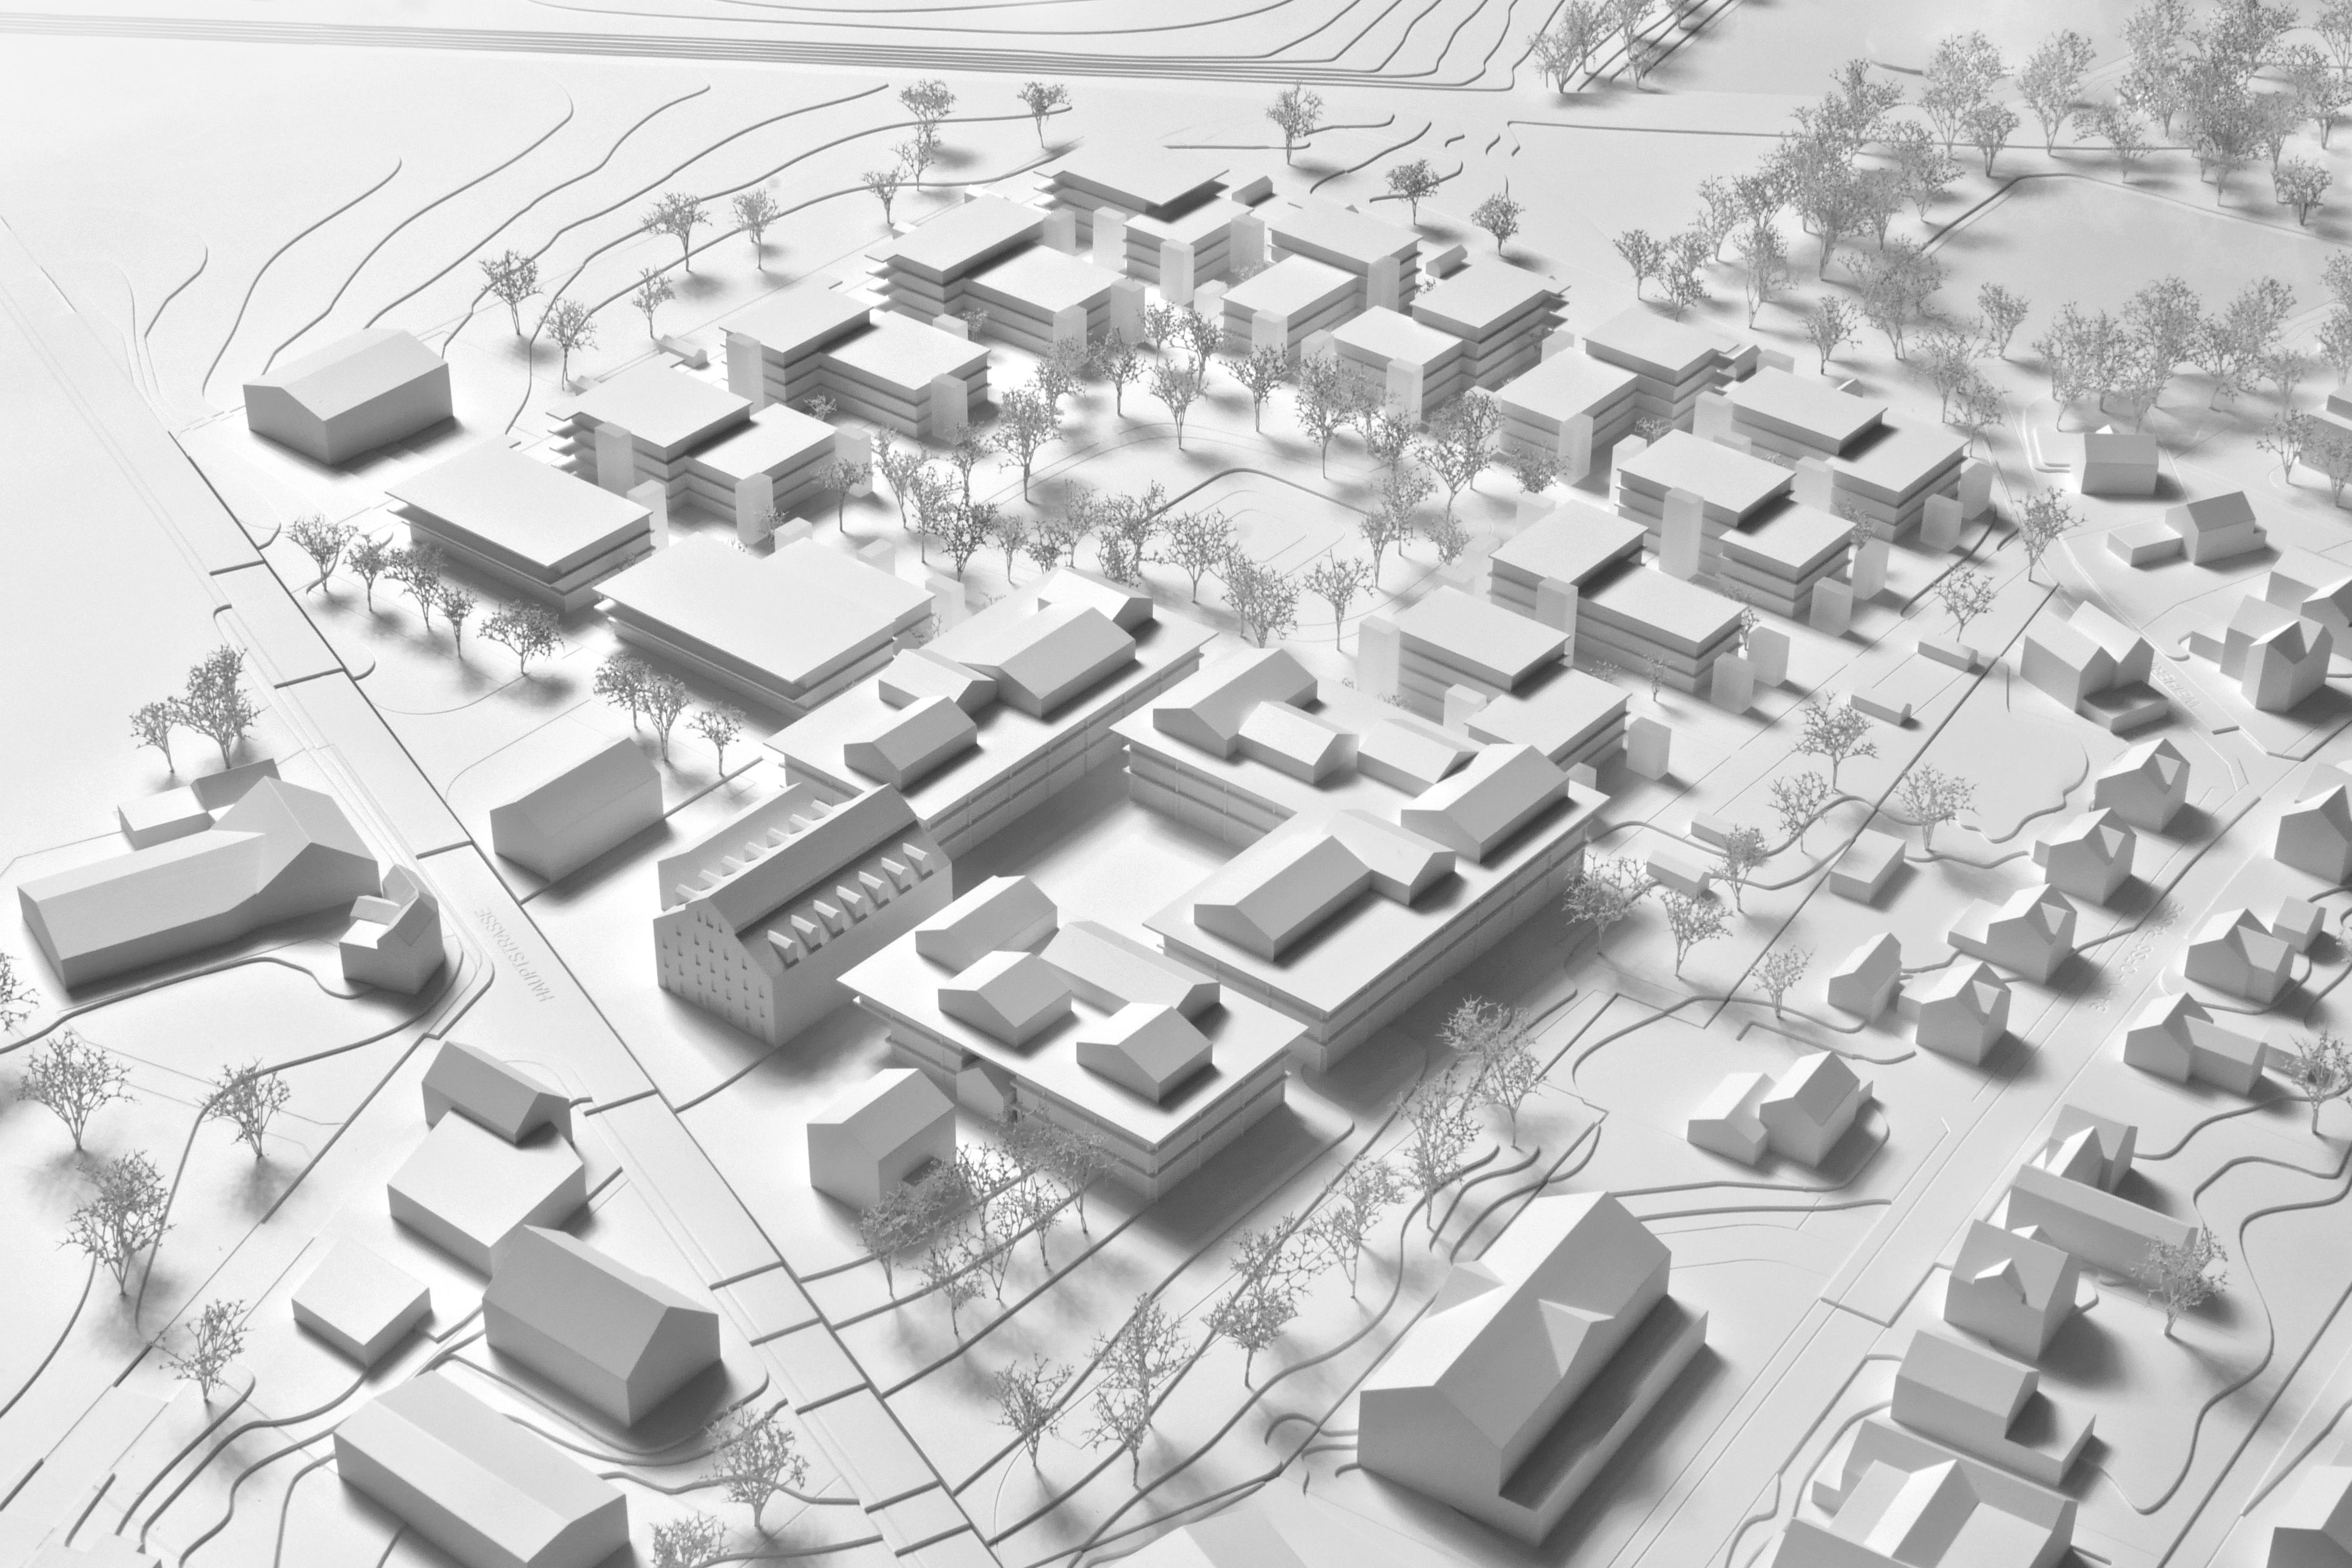 Richtprojekt Ziegelei Berg: Modell (Gruber Forster Modellbau)